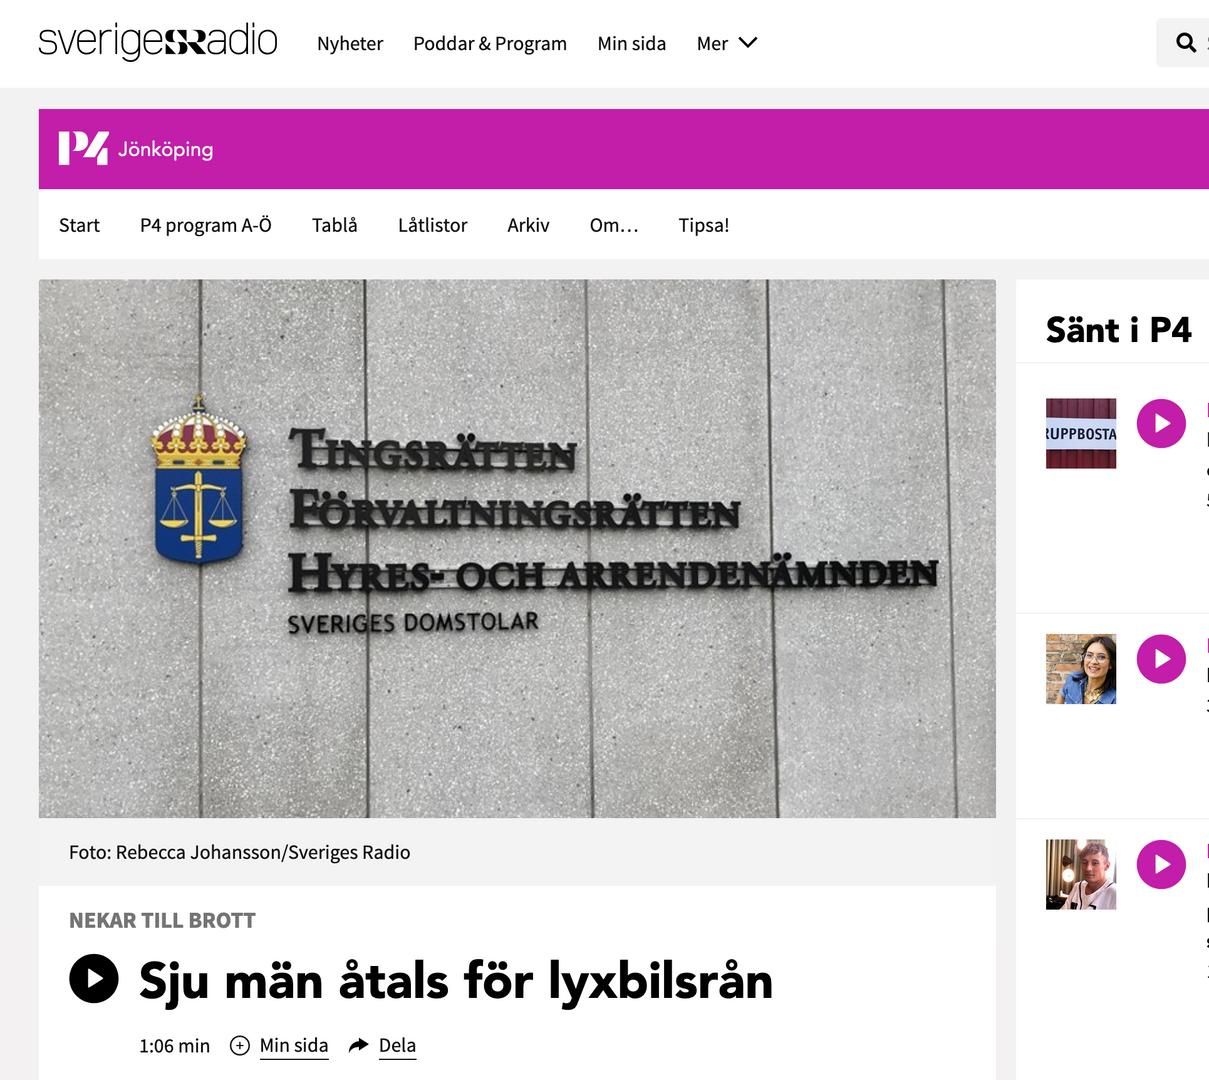 Lundell & Sjölander - Sveriges Radio